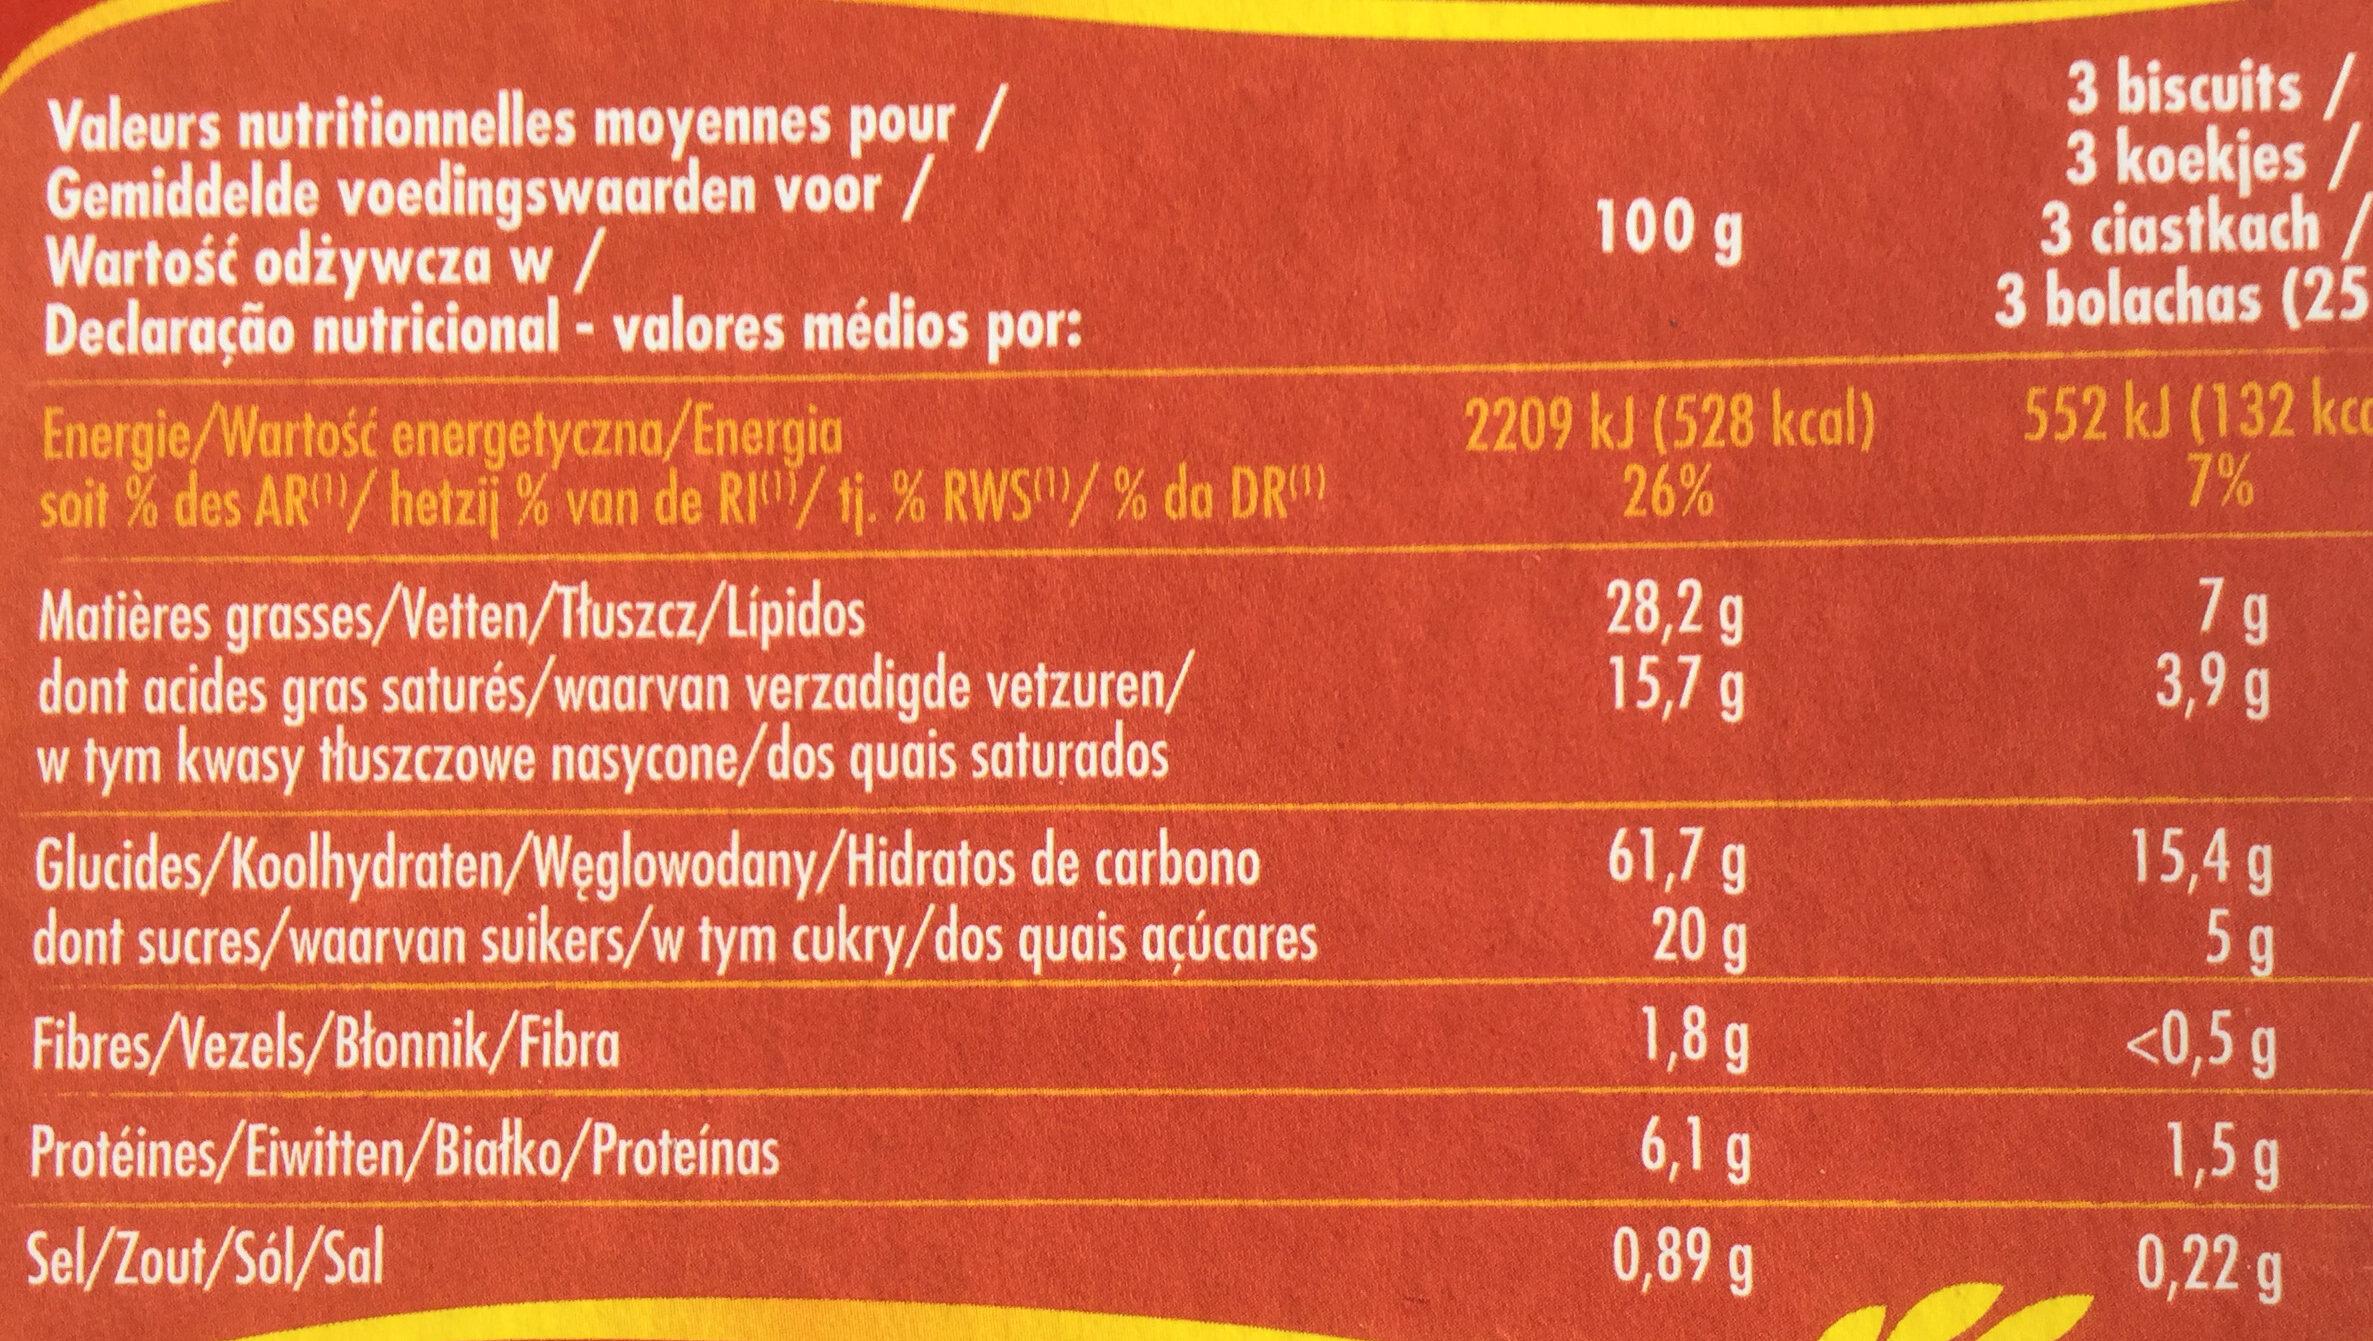 Feuilletés palmiers croustillants - Wartości odżywcze - pl